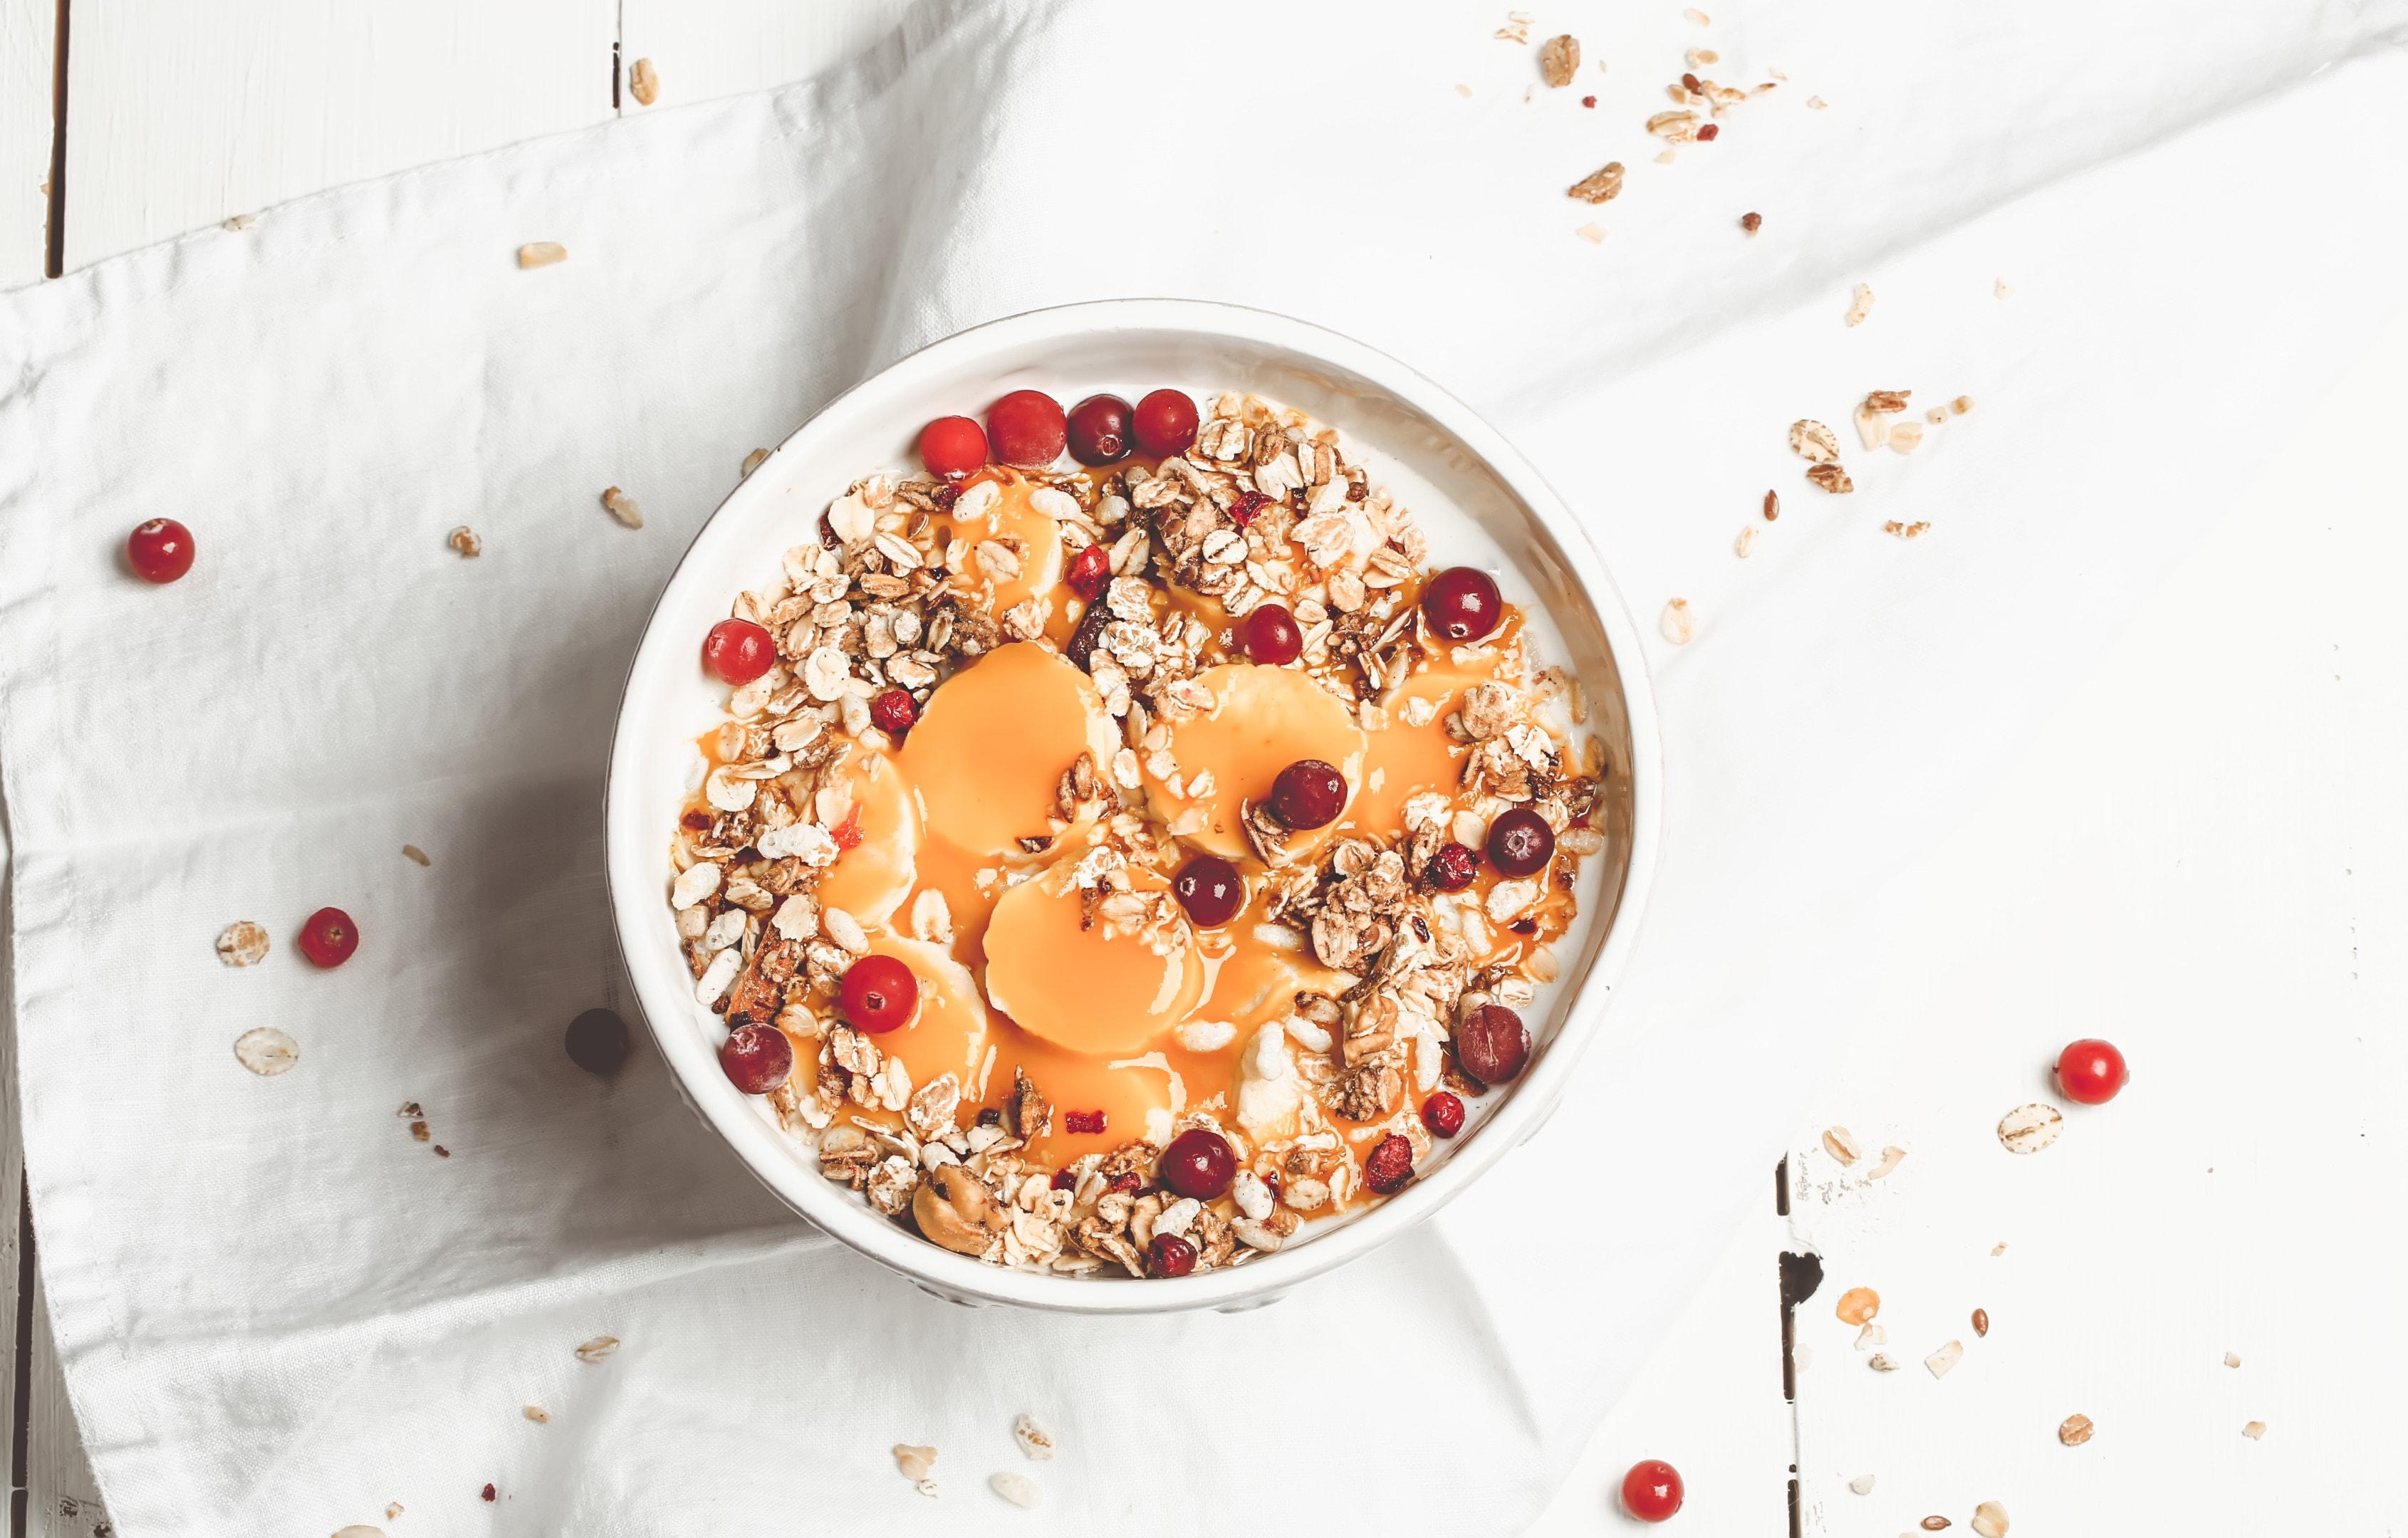 Oatmeal with berries banana and mango